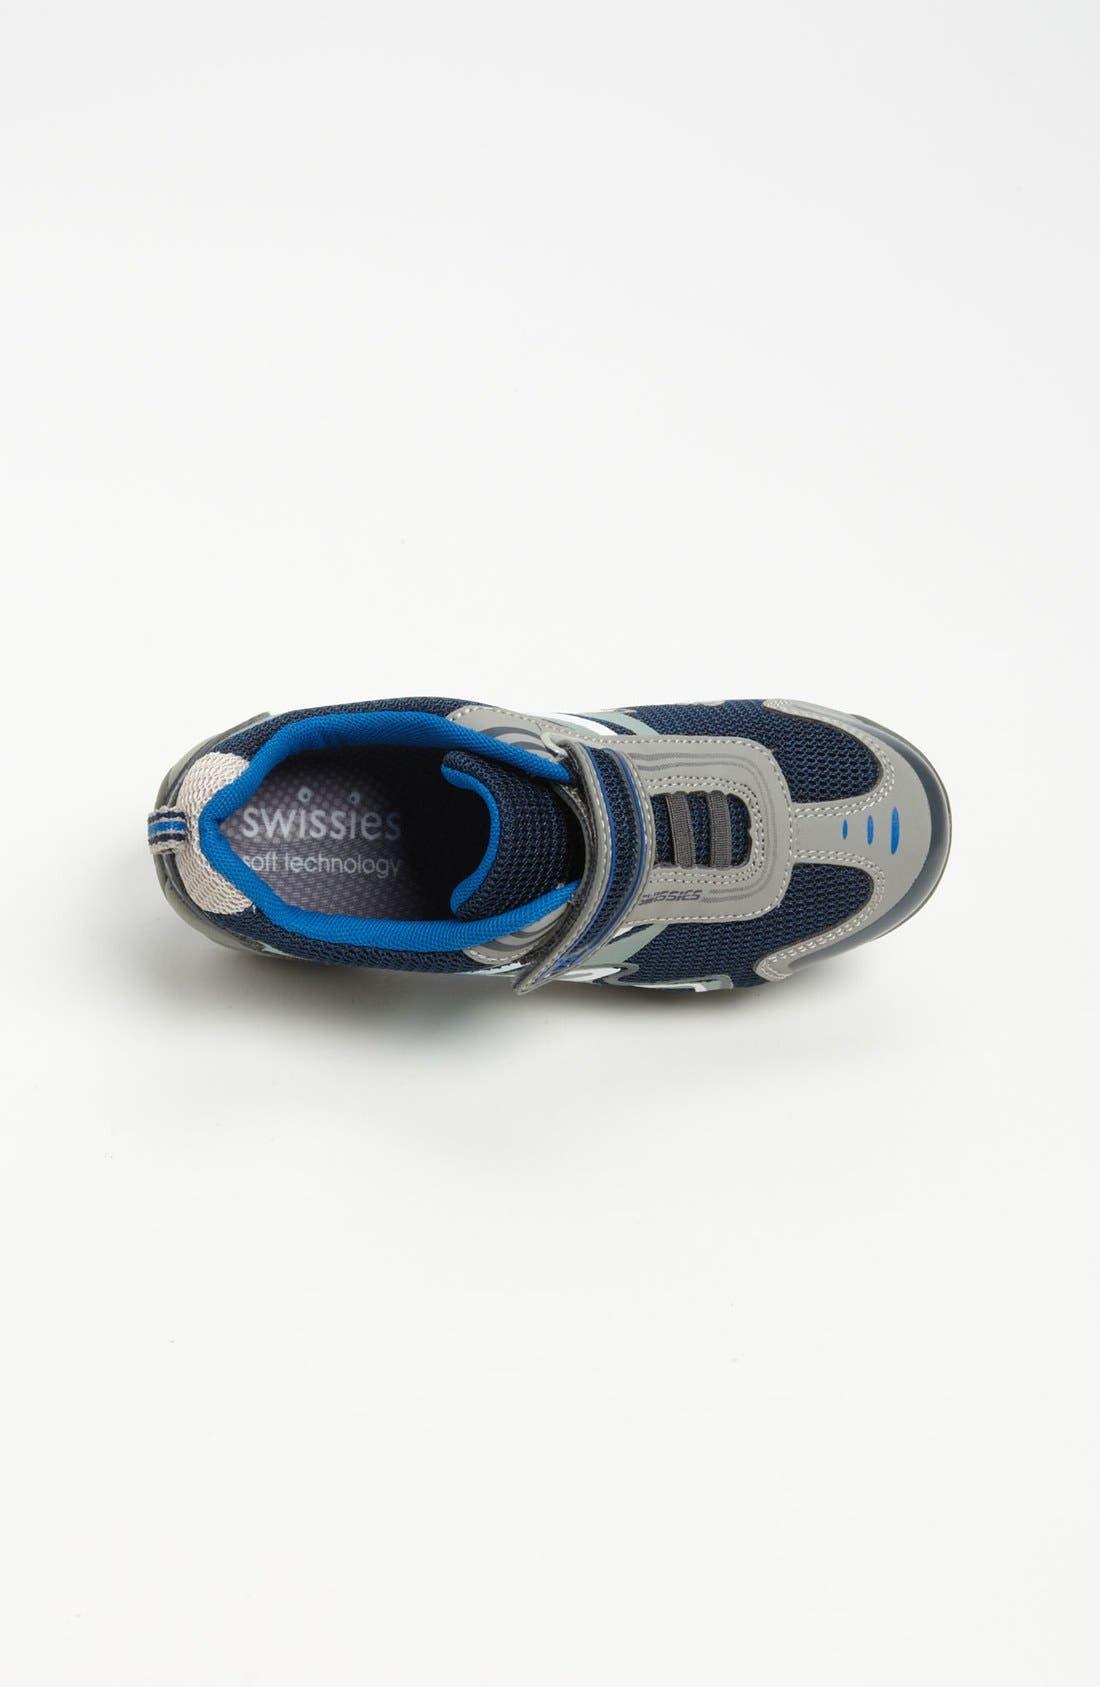 Alternate Image 3  - Swissies 'Speed' Sneaker (Toddler & Little Kid)